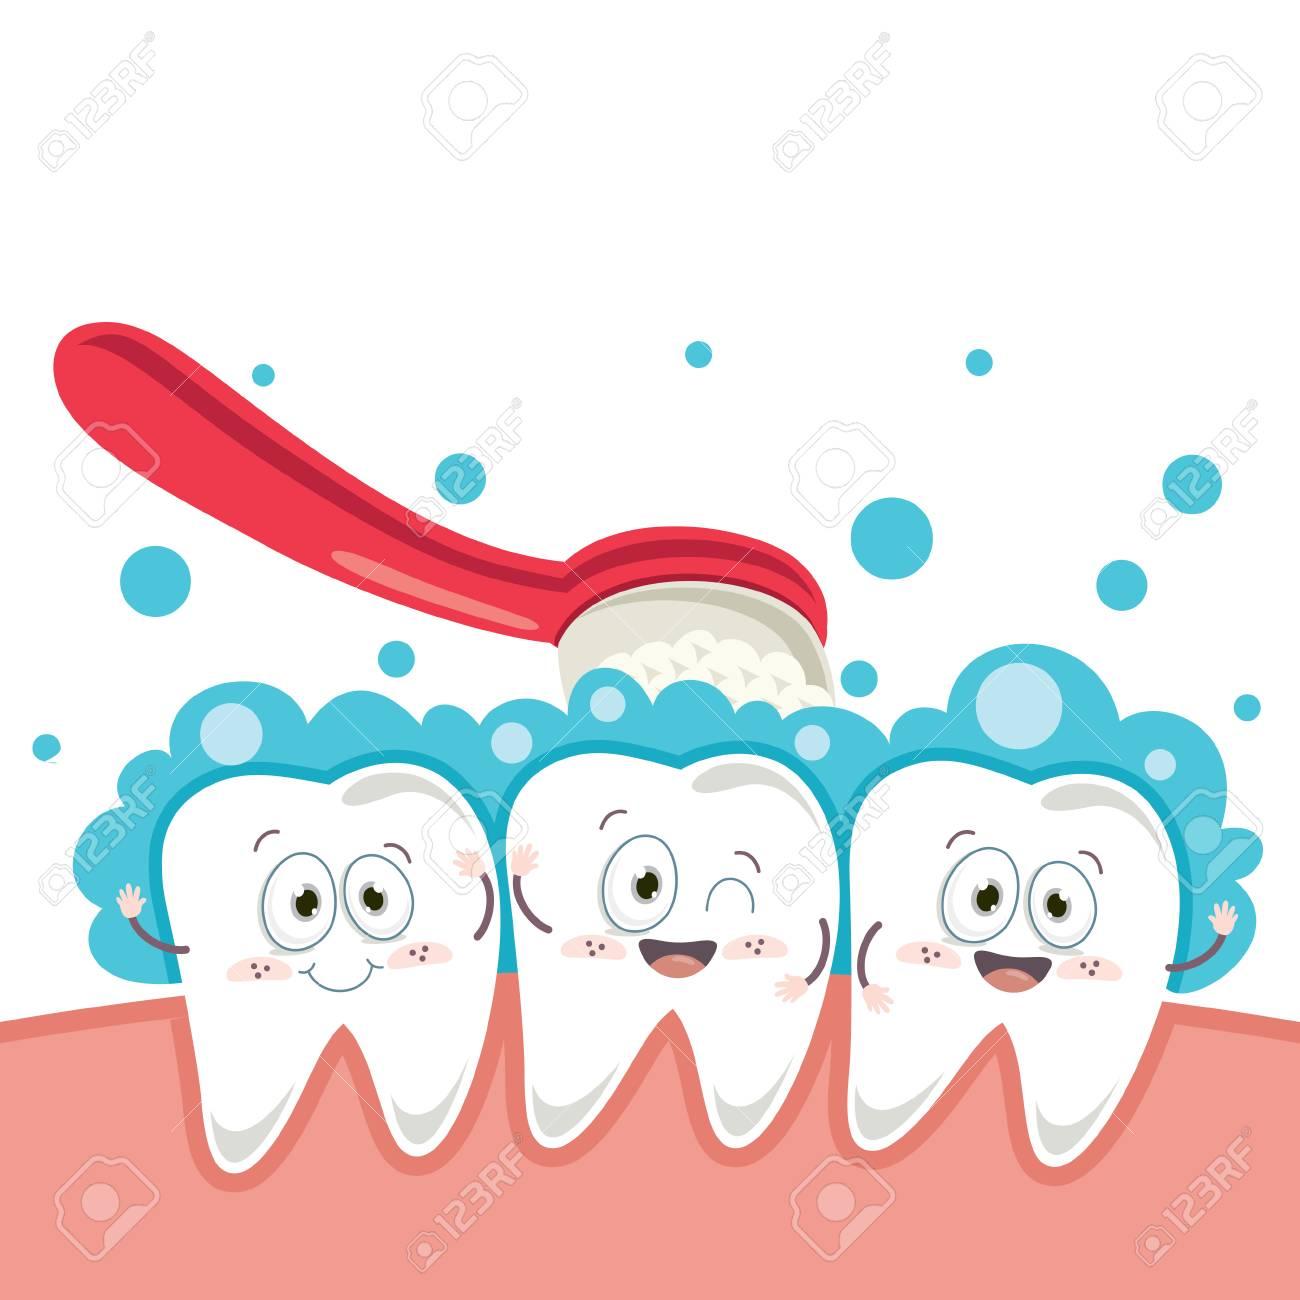 Vector Illustration Of Cartoon Tooth - 101799587